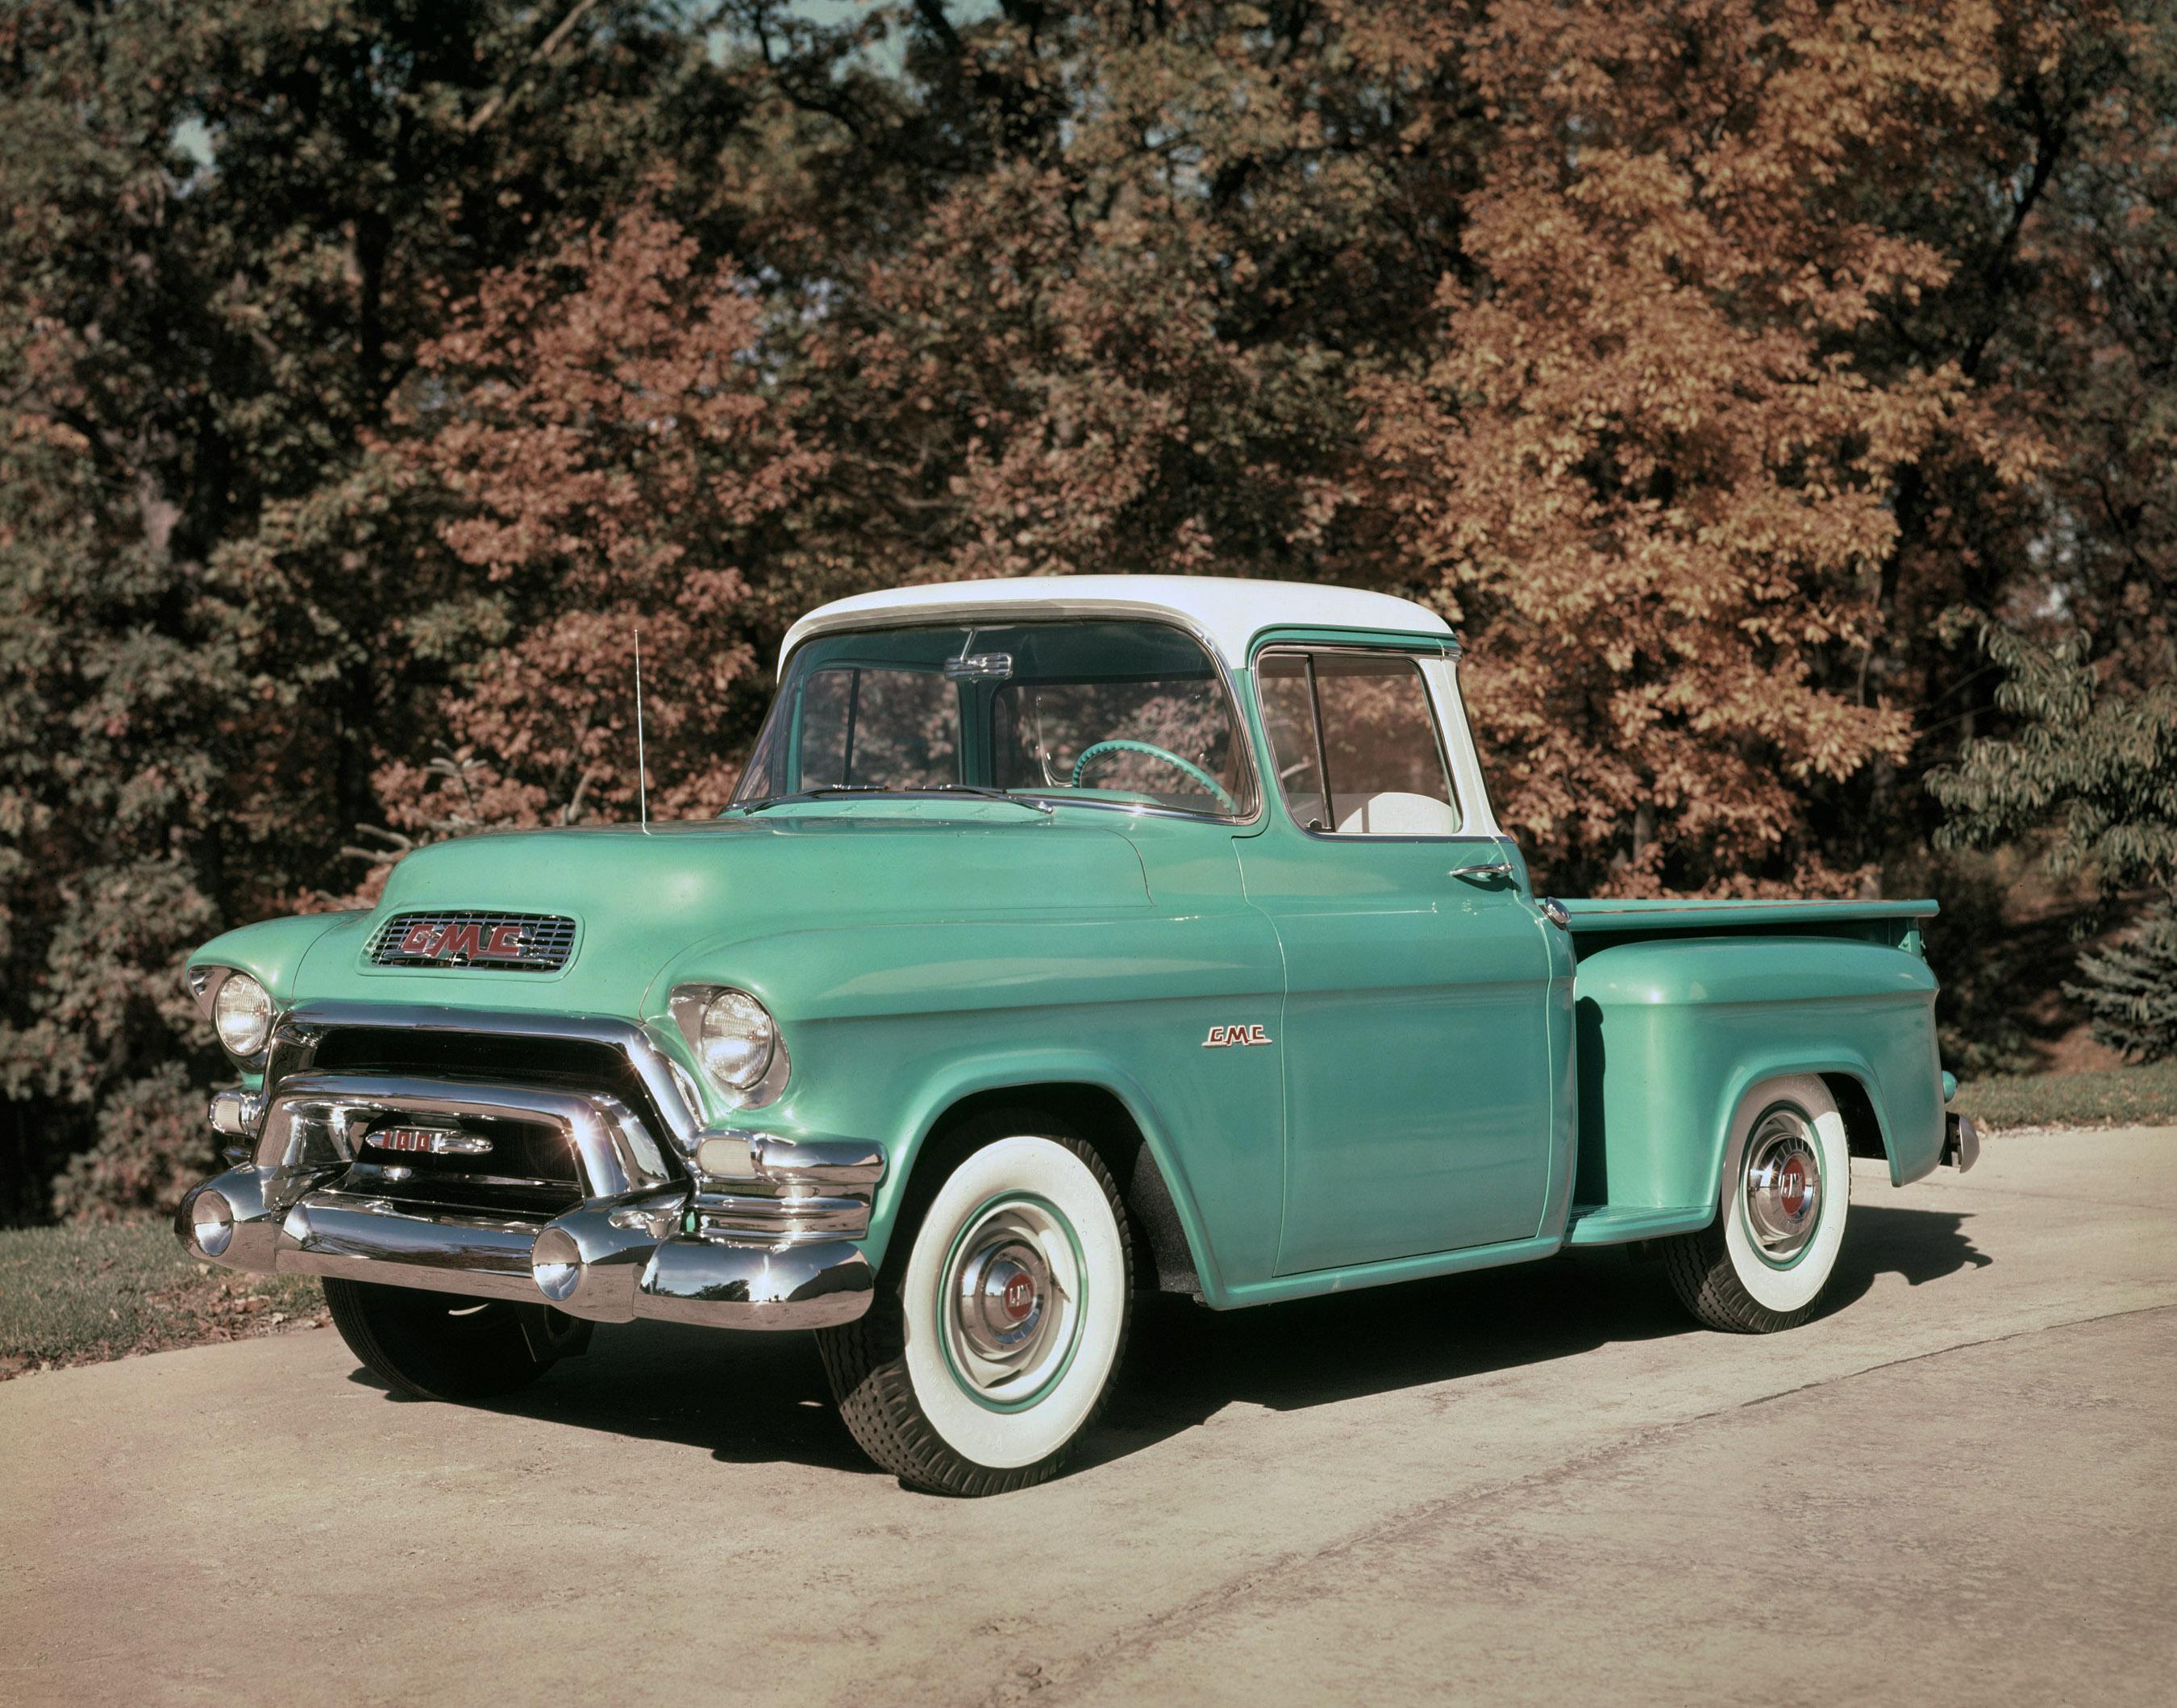 New Sierra Marks 111 Years of GMC Pickup Heritage